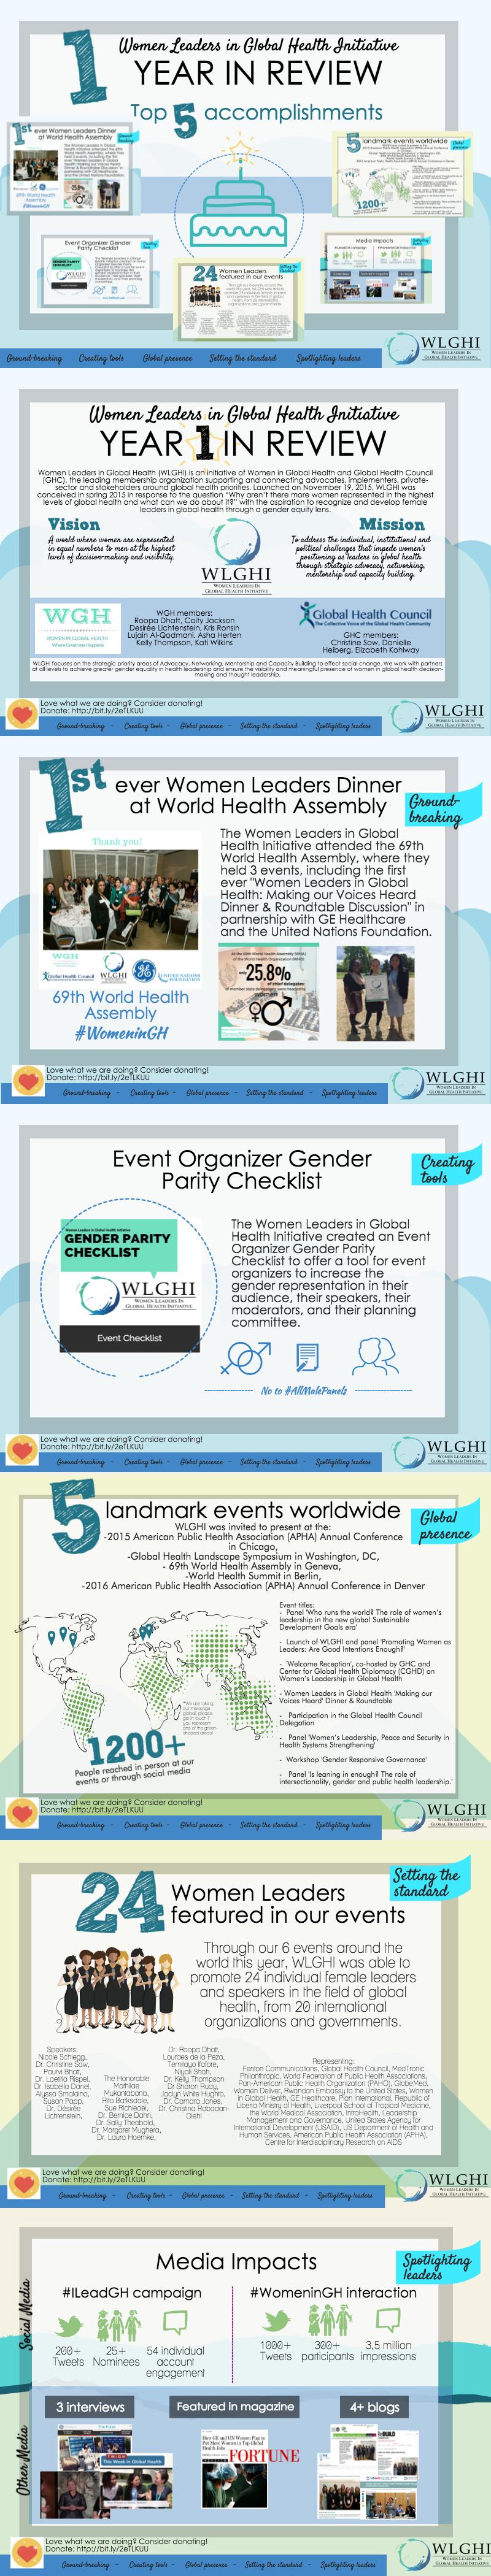 Top 5 successes of WLGHI